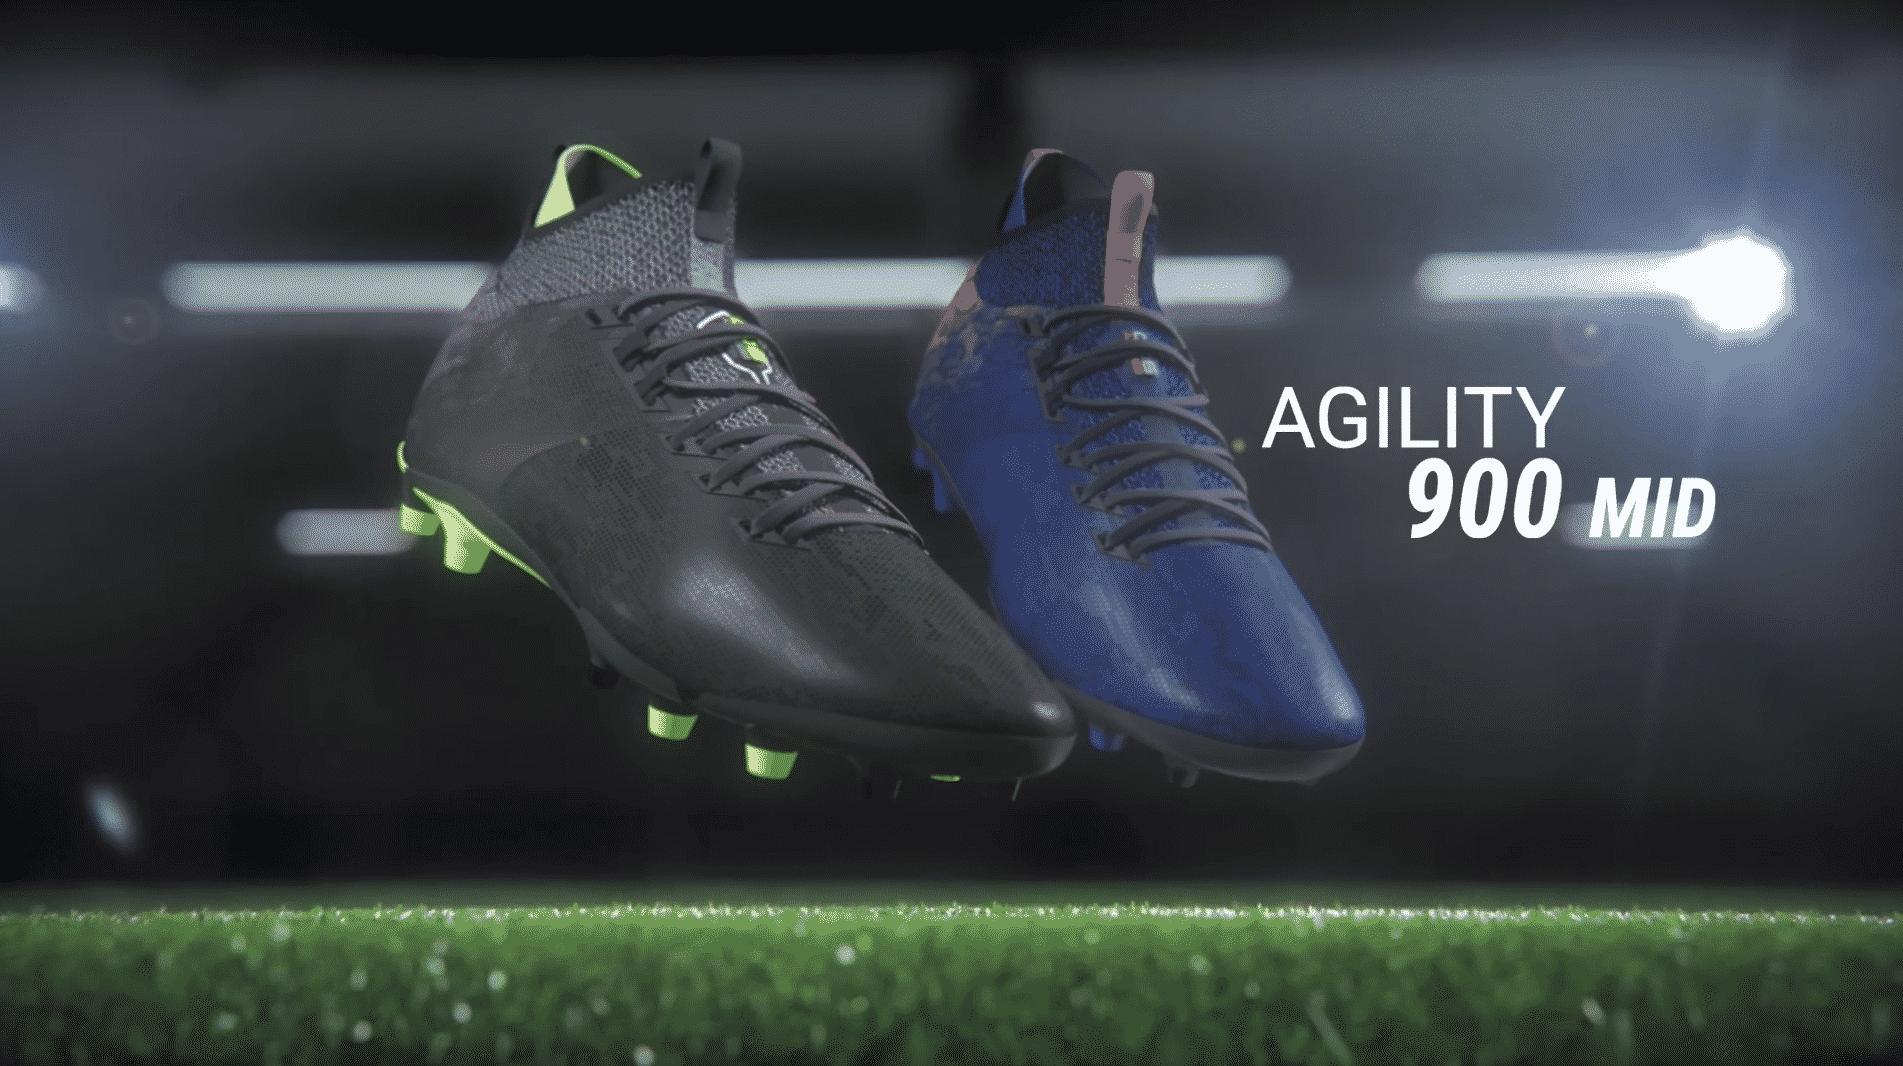 chaussures-football-Kipsta-Agility-900-Mid-img2